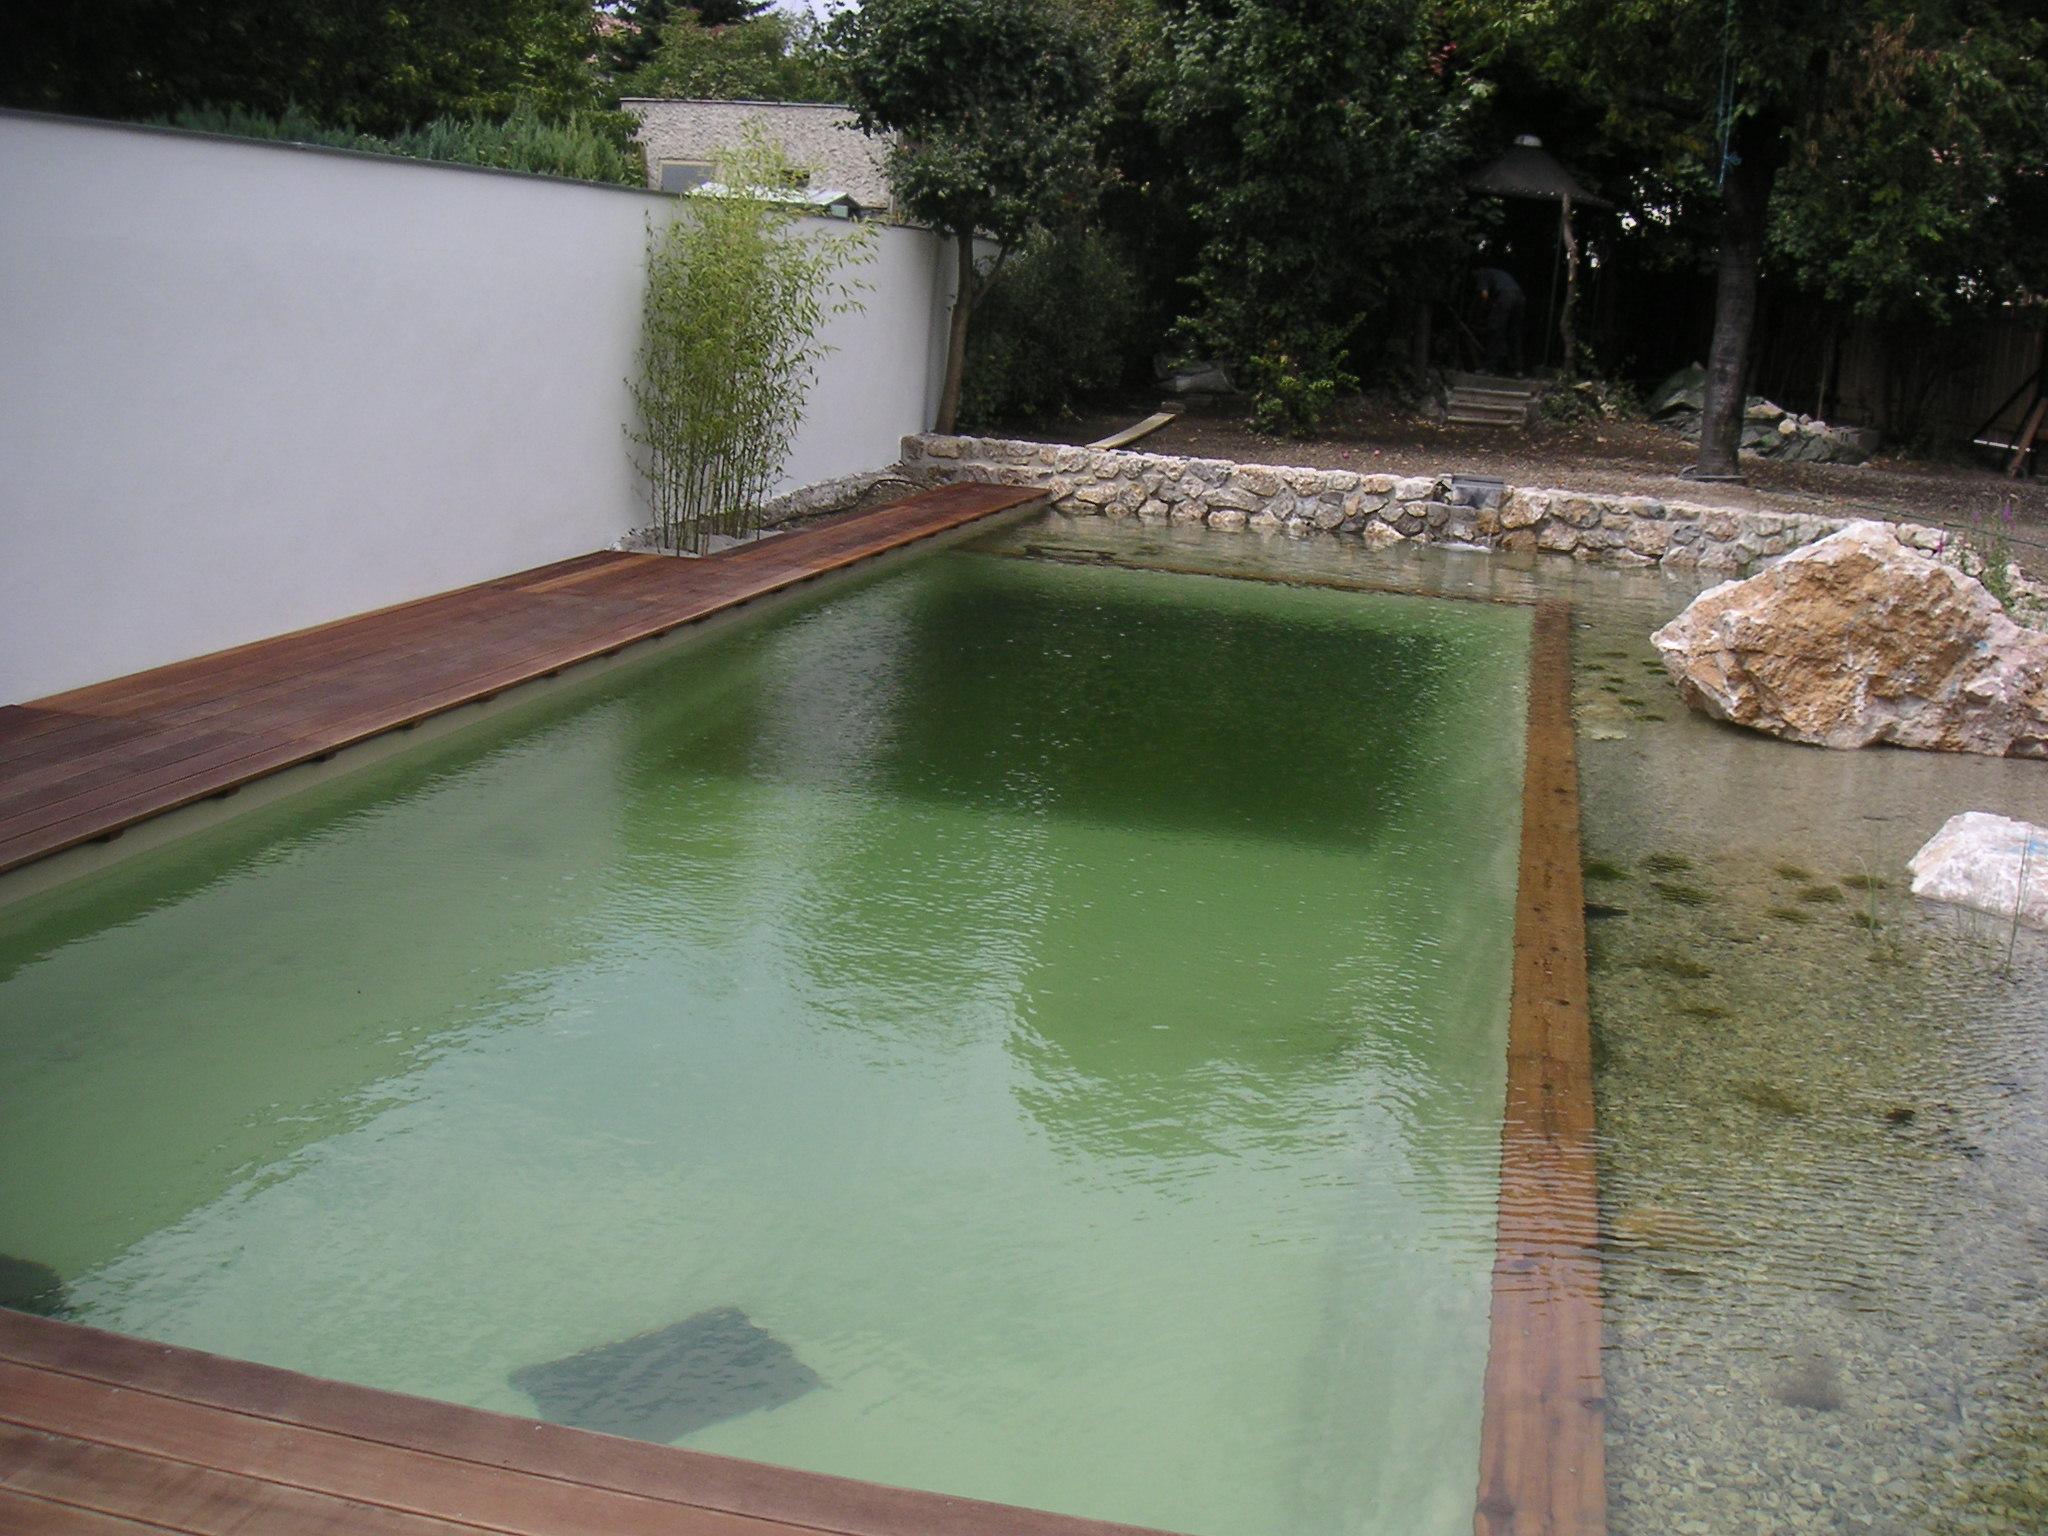 glasklares Wasser danke spezieller Technik